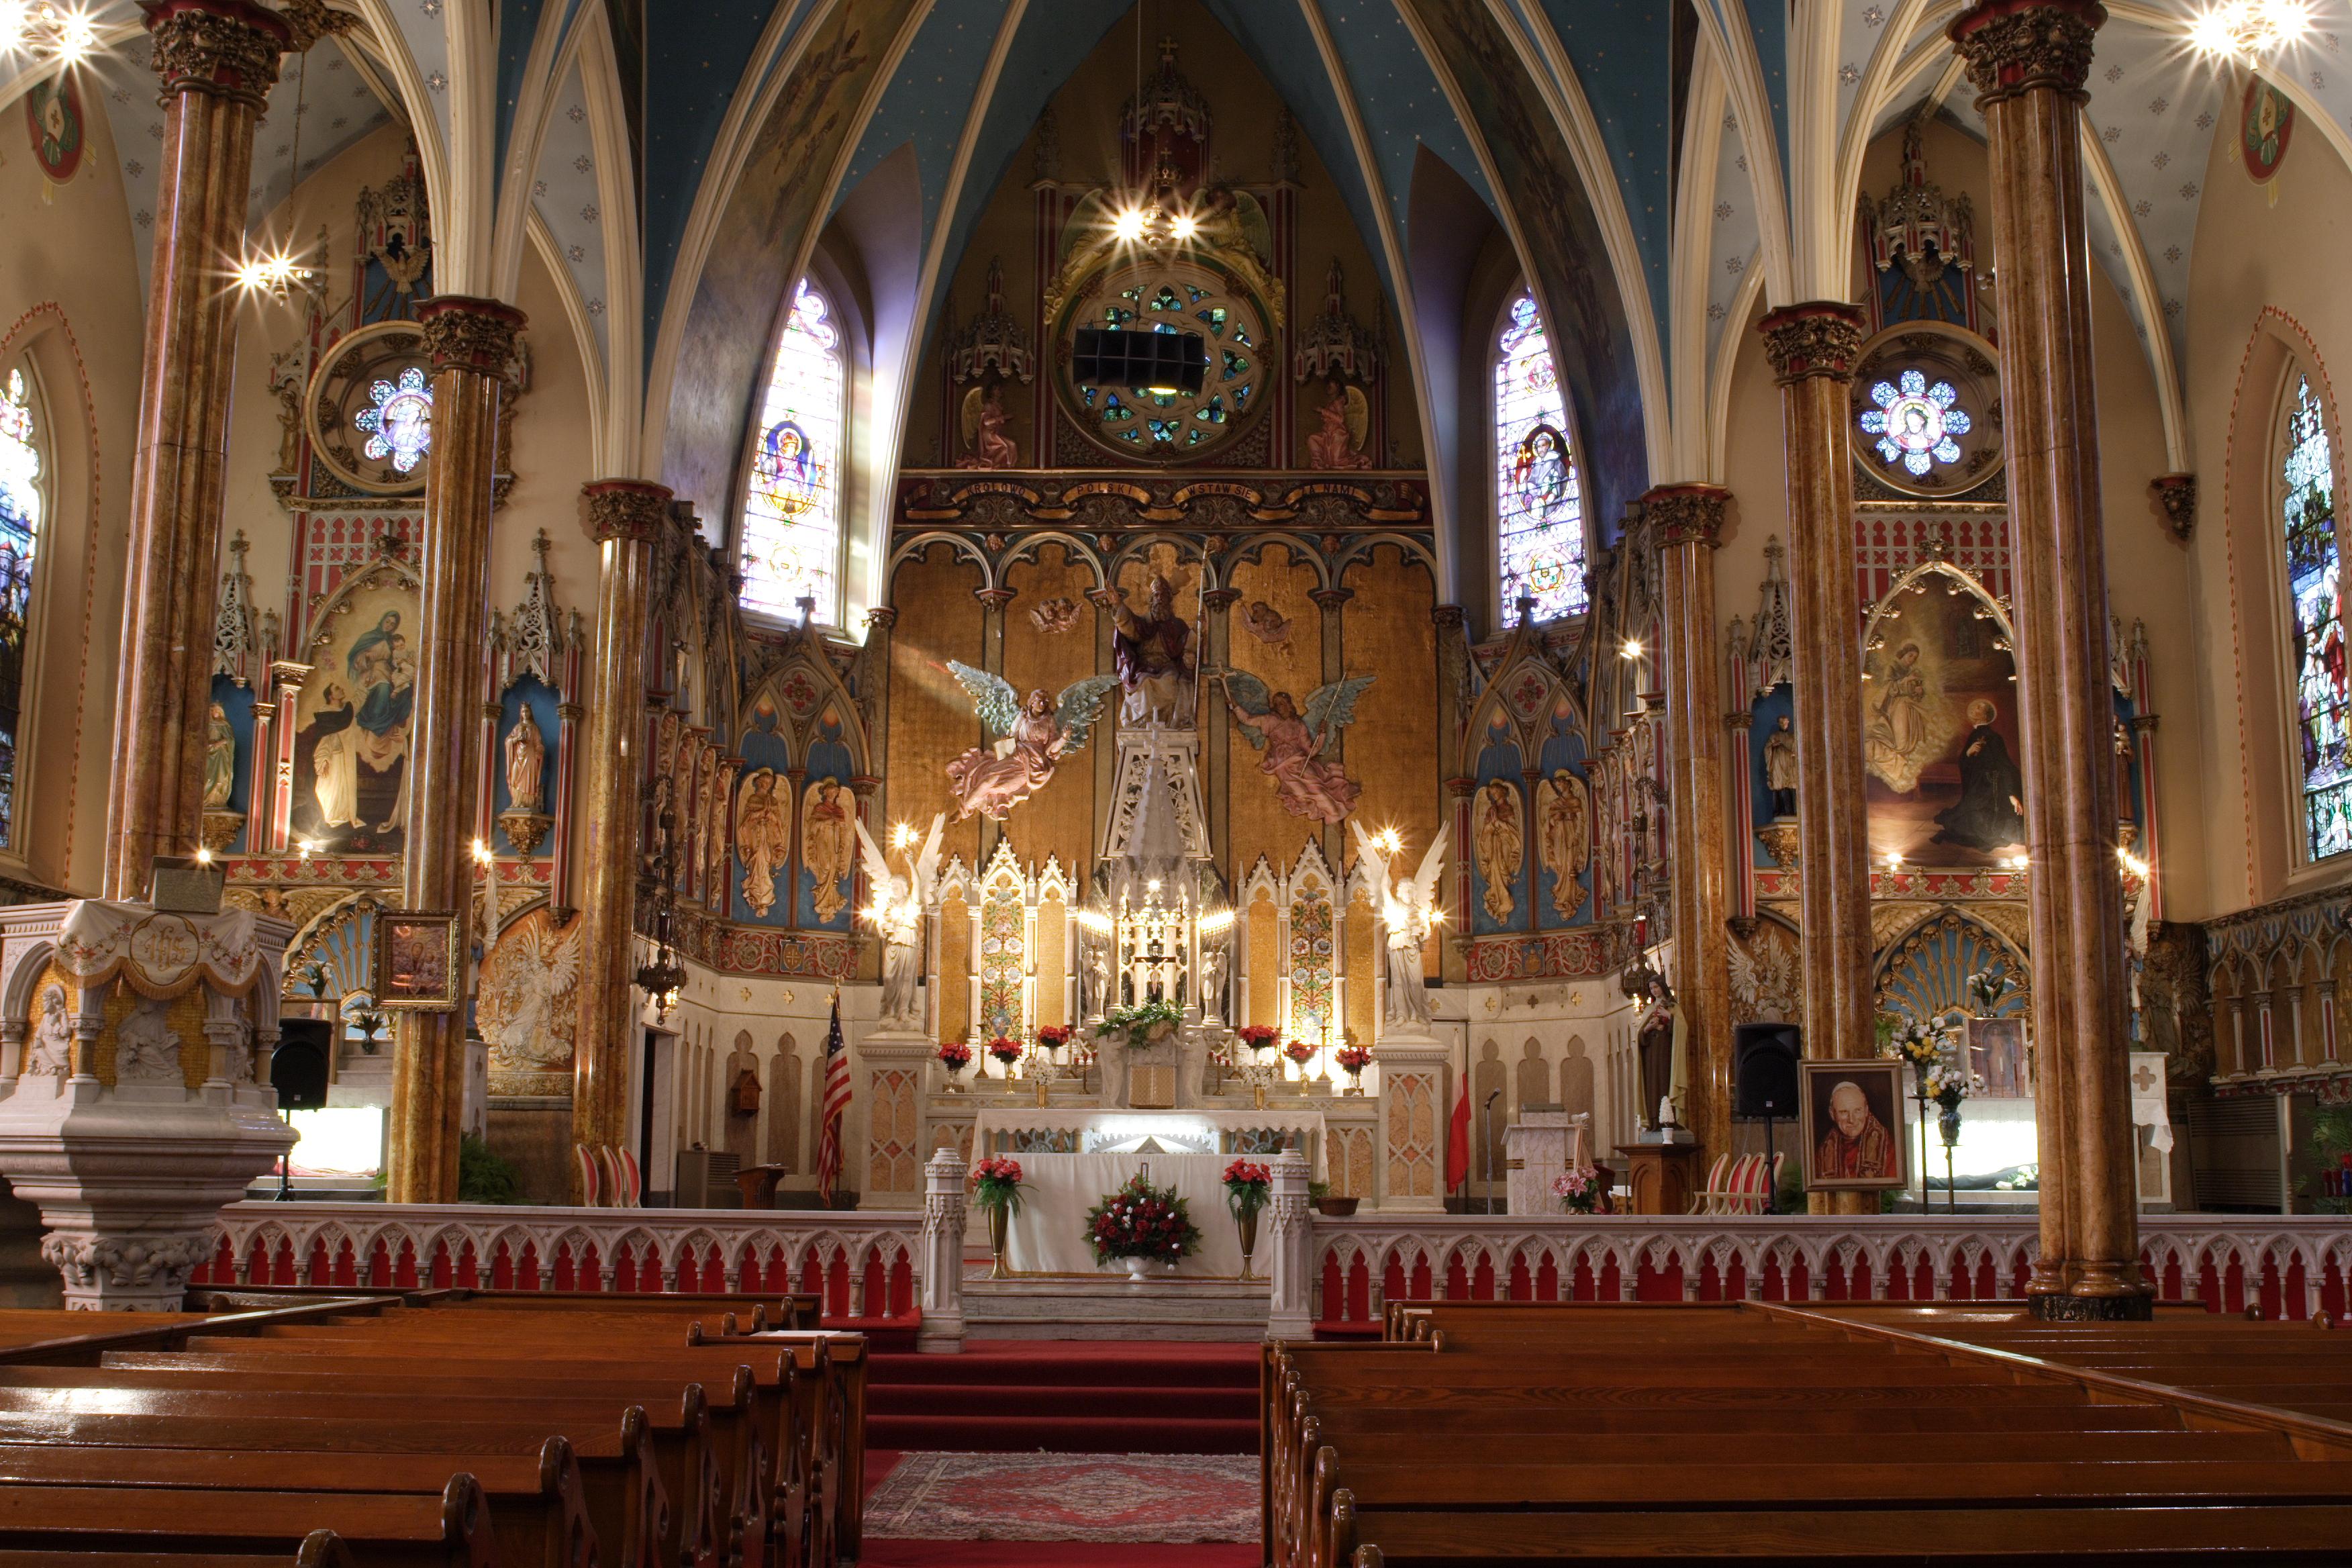 St. Joseph's Polish Roman Catholic Church